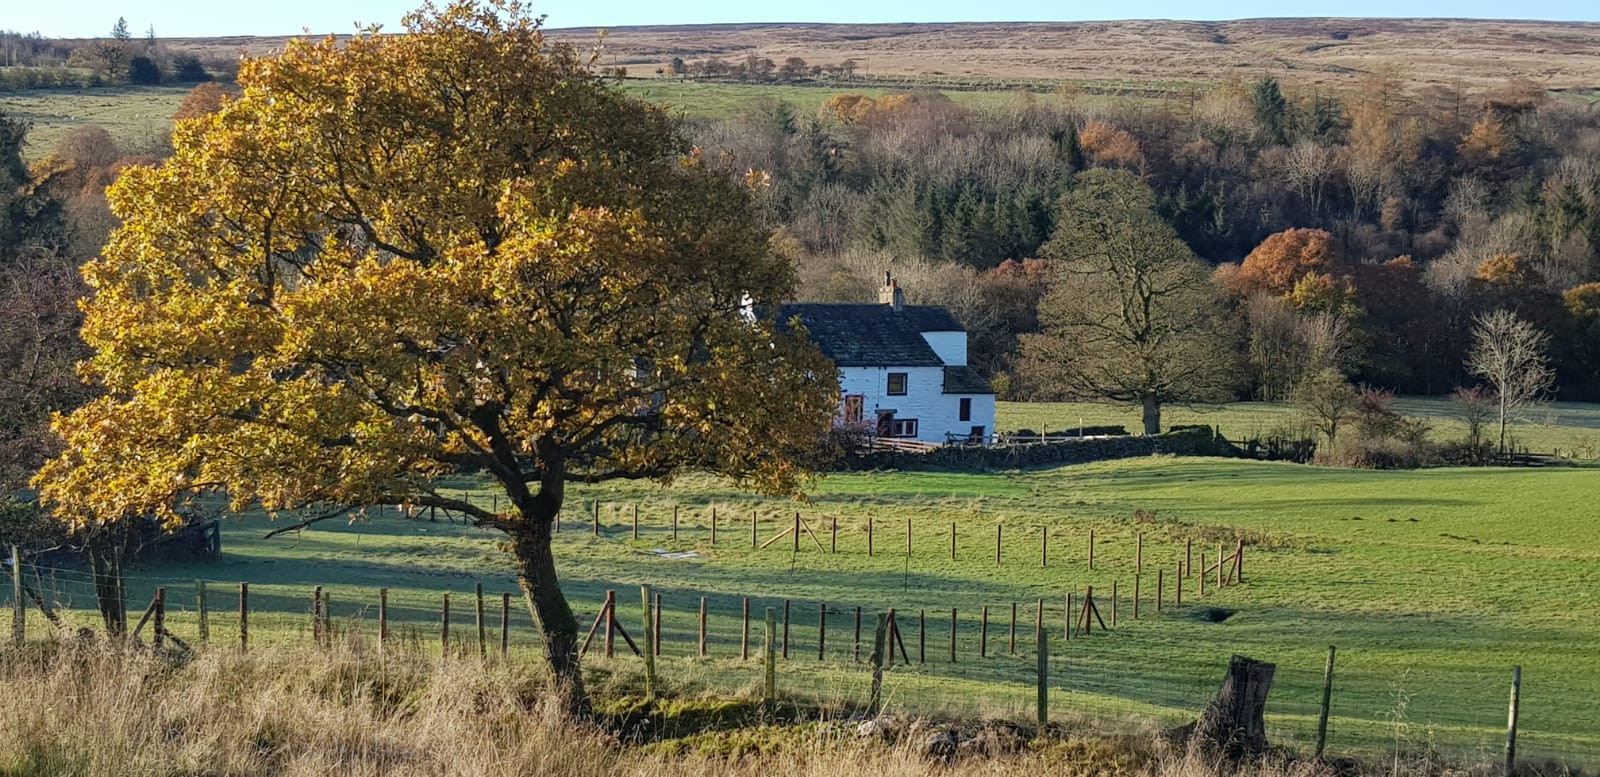 Lower Turnerford Farmhouse